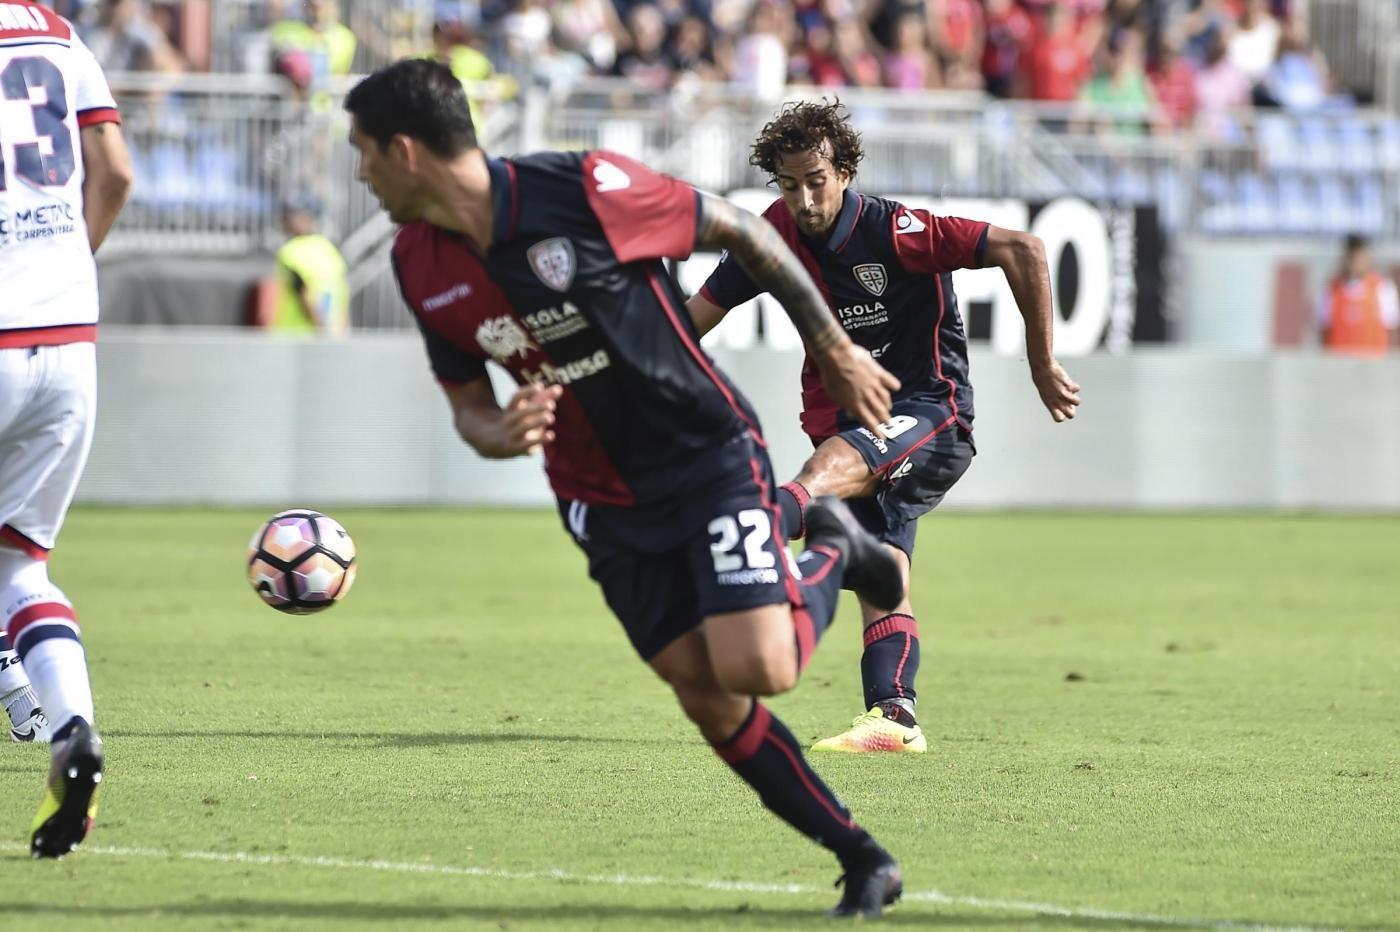 Cagliari - Crotone, gol ed emozioni al Sant'Elia - Sportmediaset - Foto 25